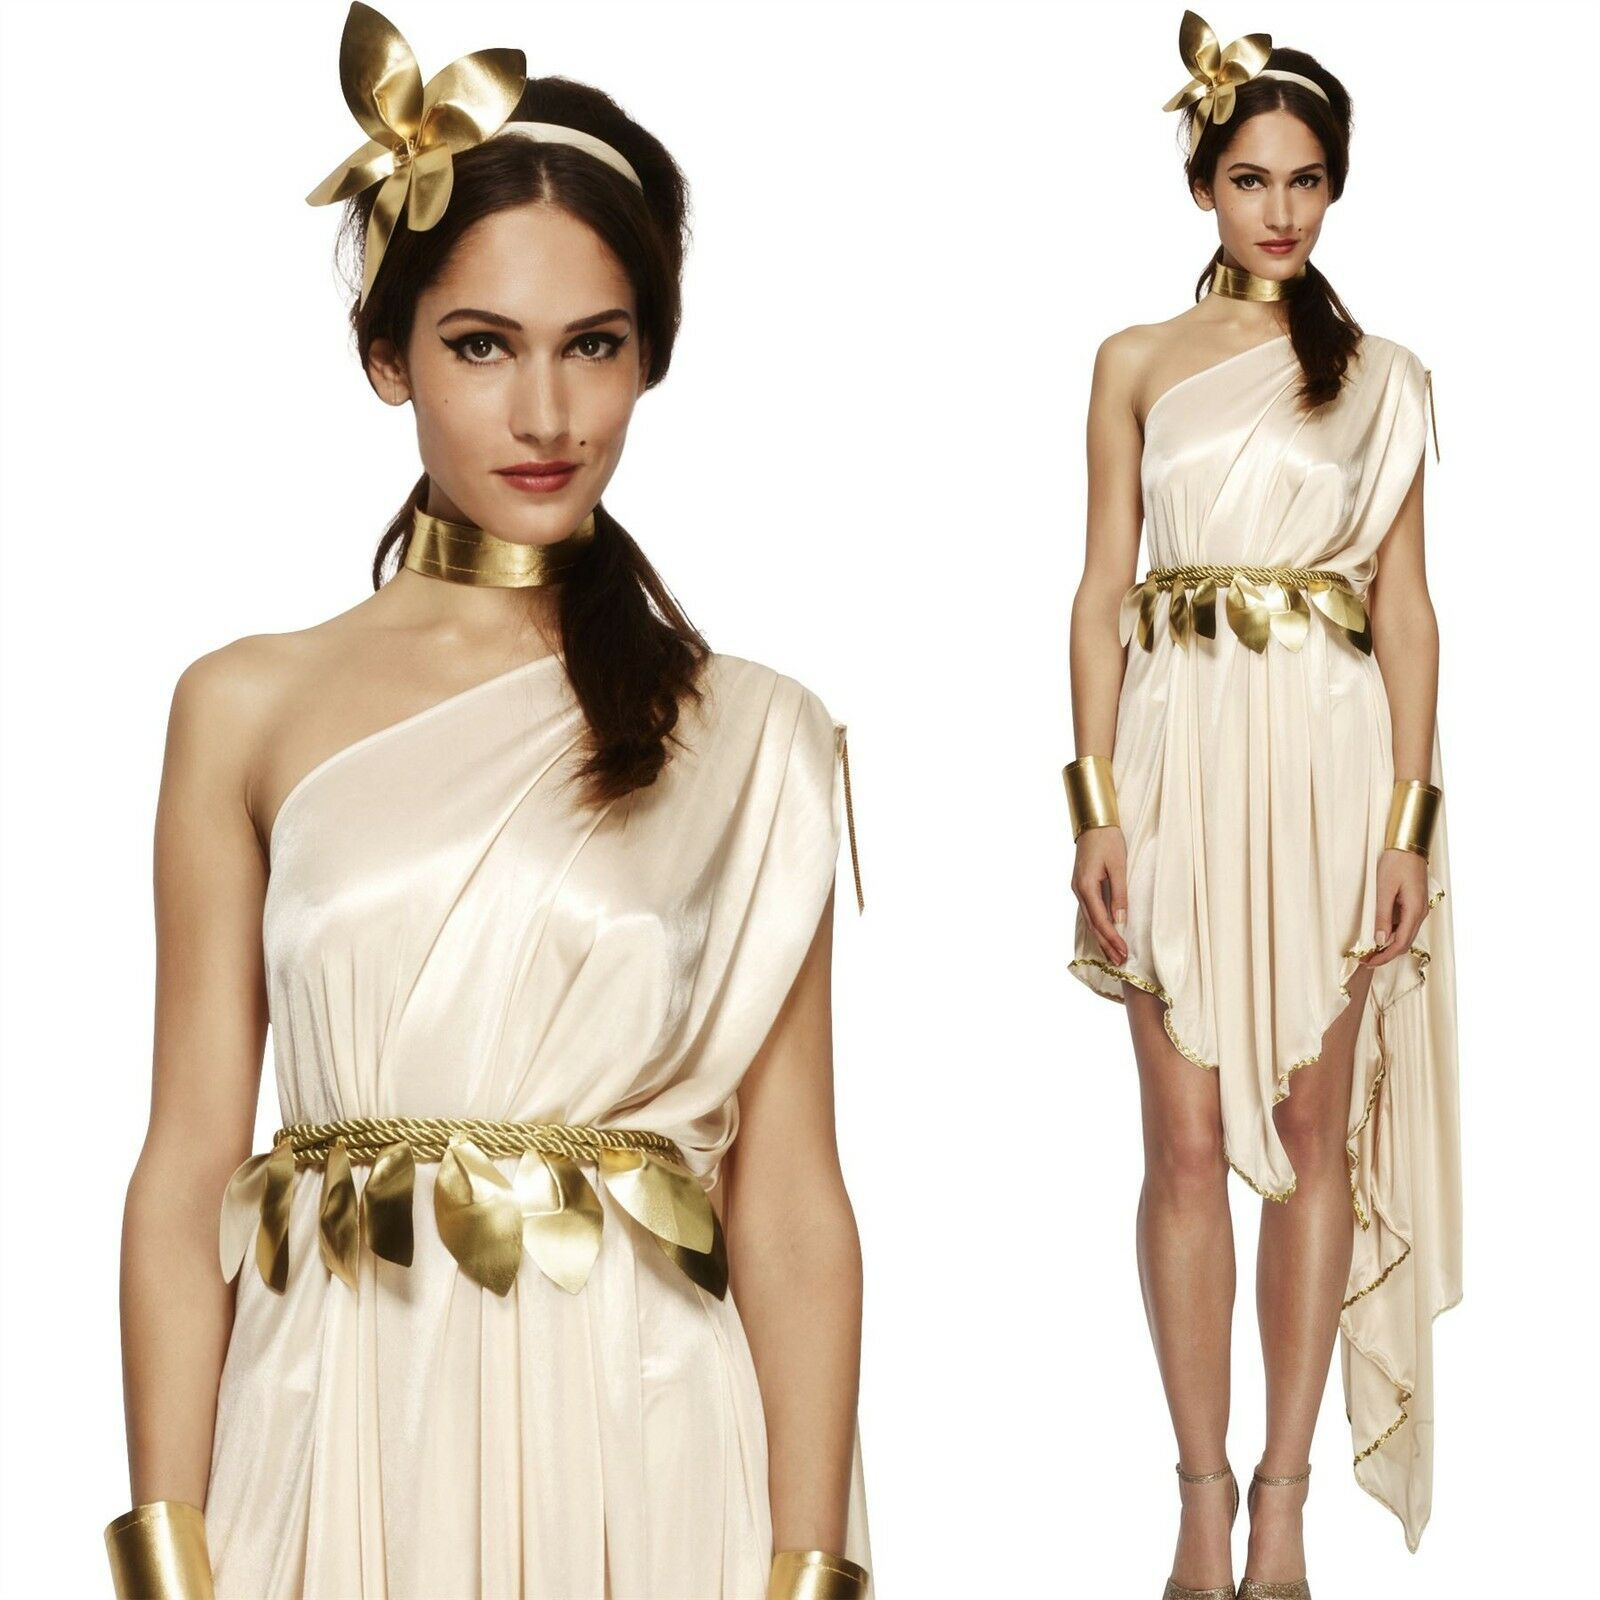 Unisex Toga Fancy Dress Costume